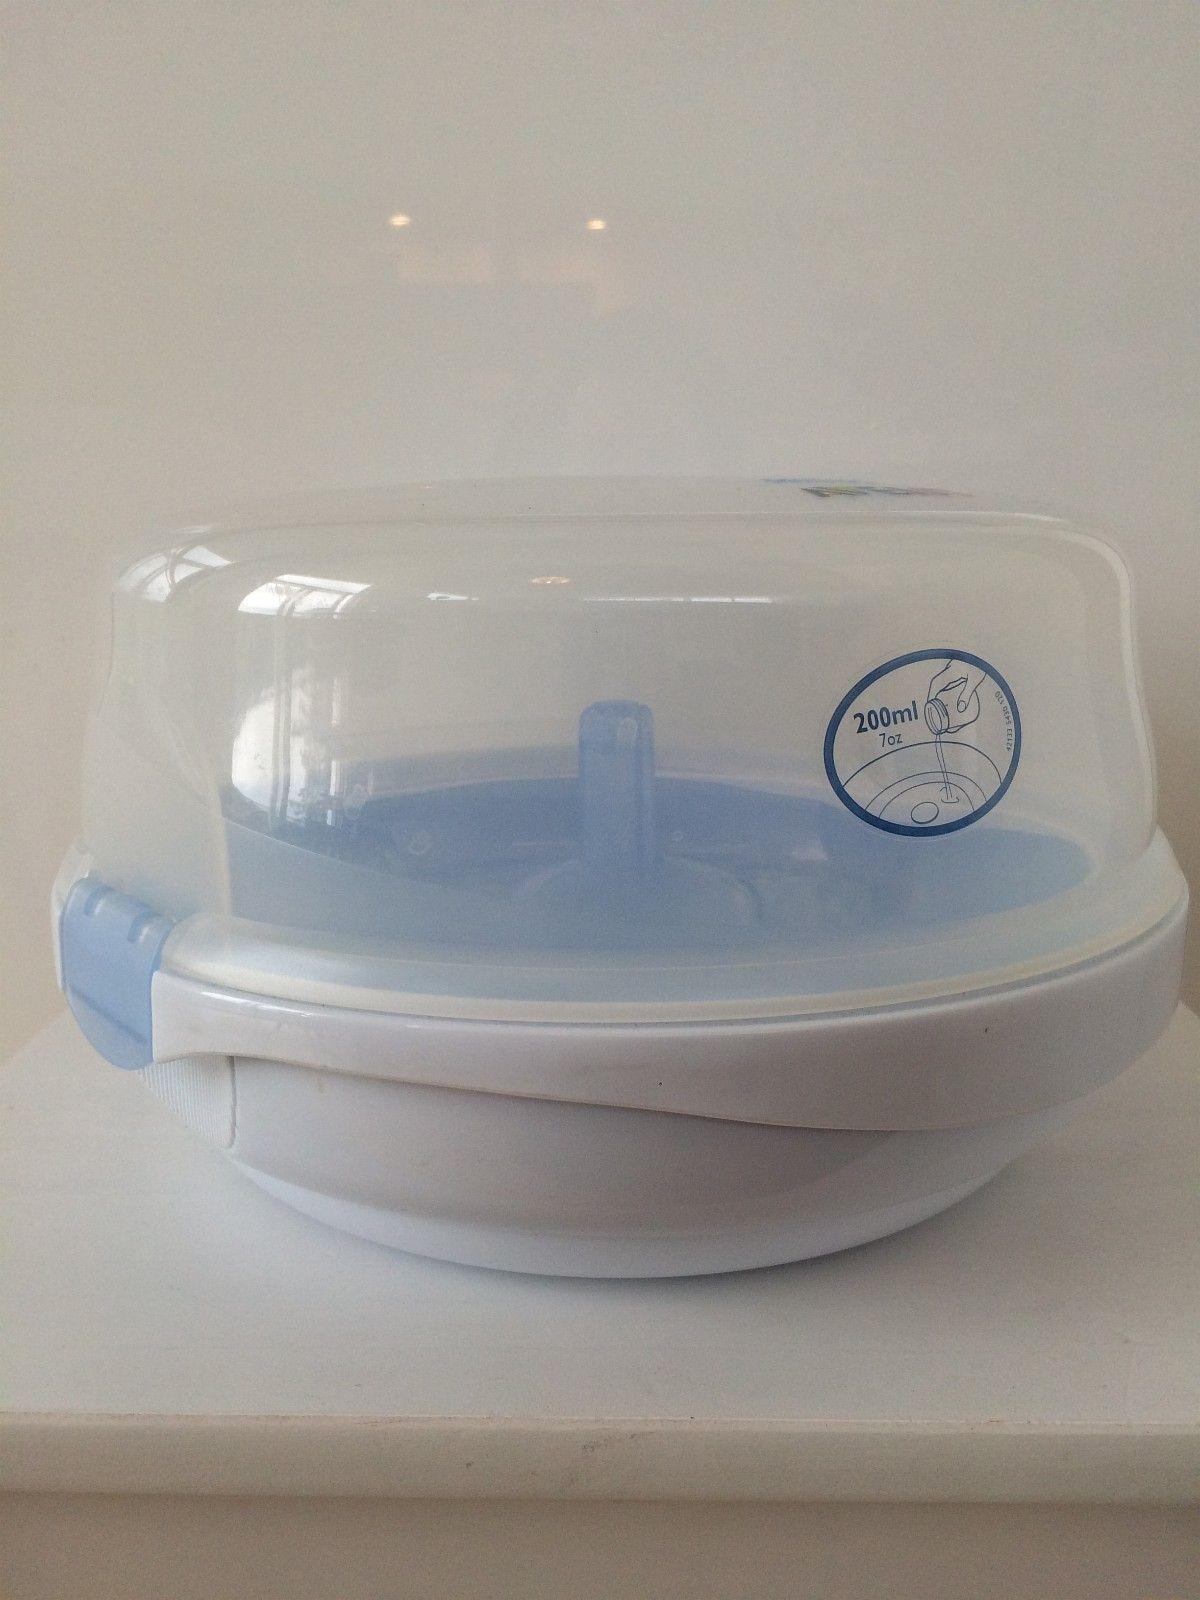 Avent flaskesterilisator - Sandnes  - Avent flaskesterilisator, pent brukt, ny pris 499,- selges for 150,- - Sandnes